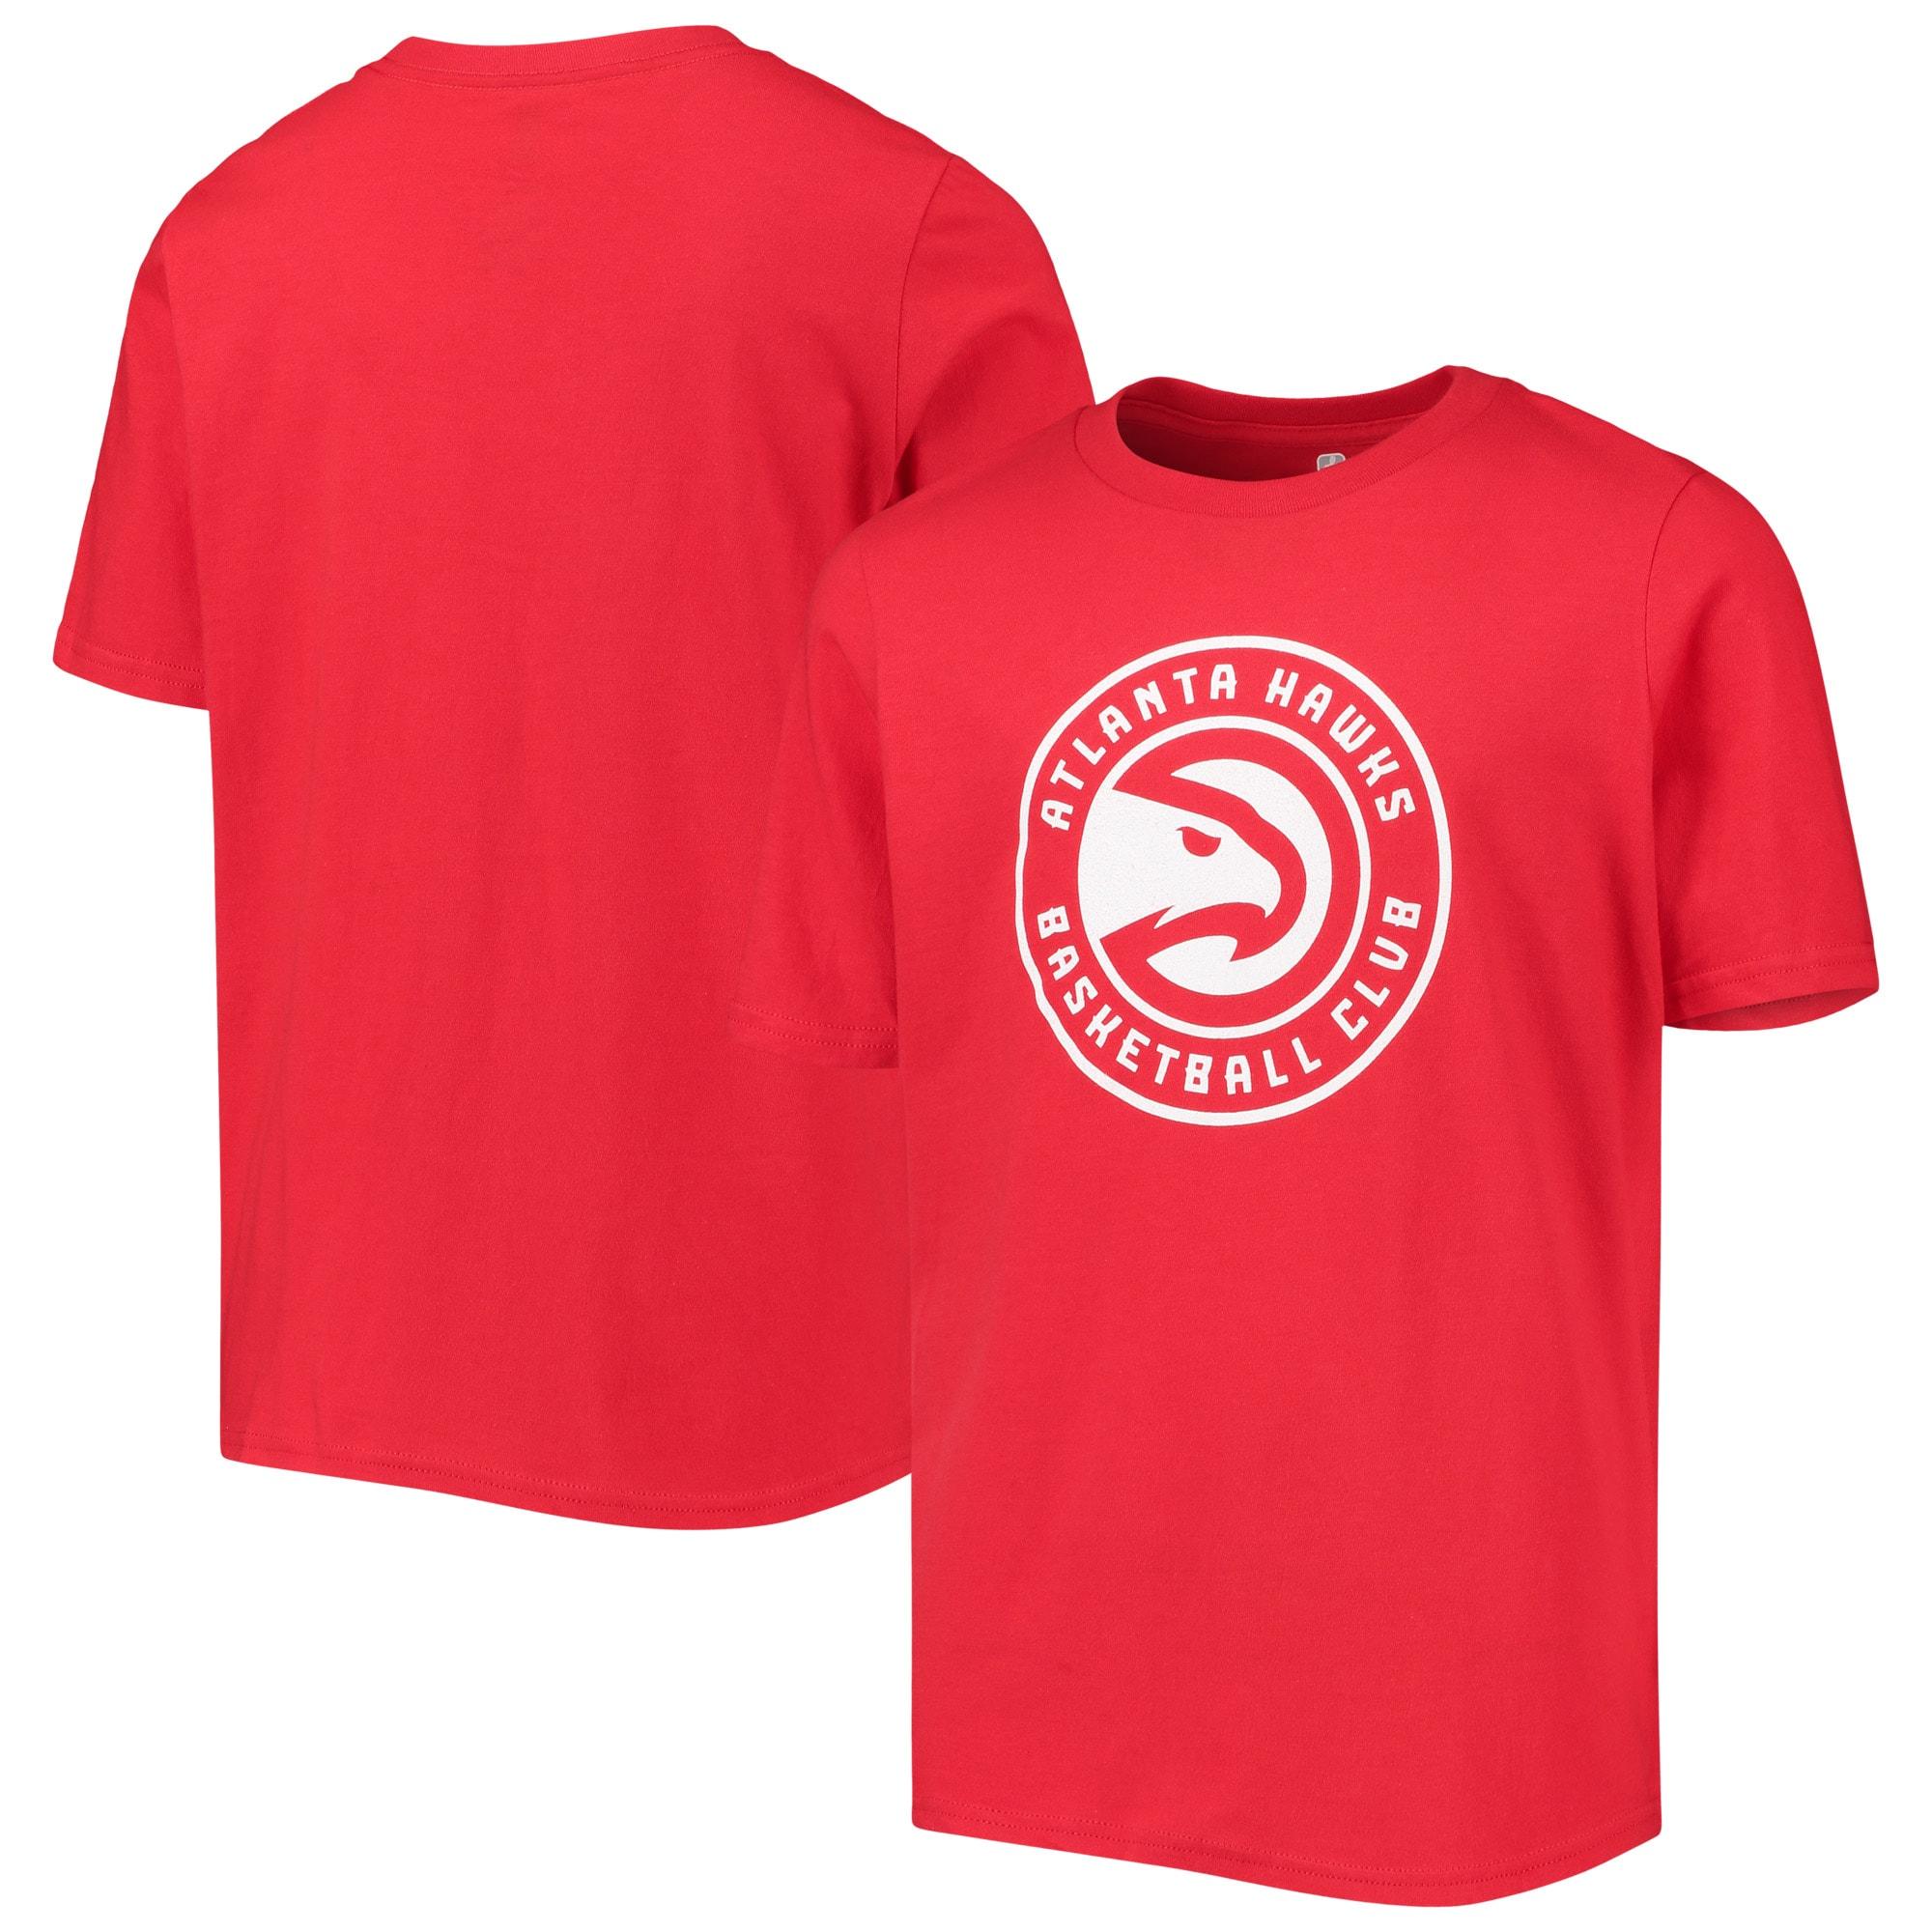 Atlanta Hawks Youth Primary Logo T-Shirt - Red